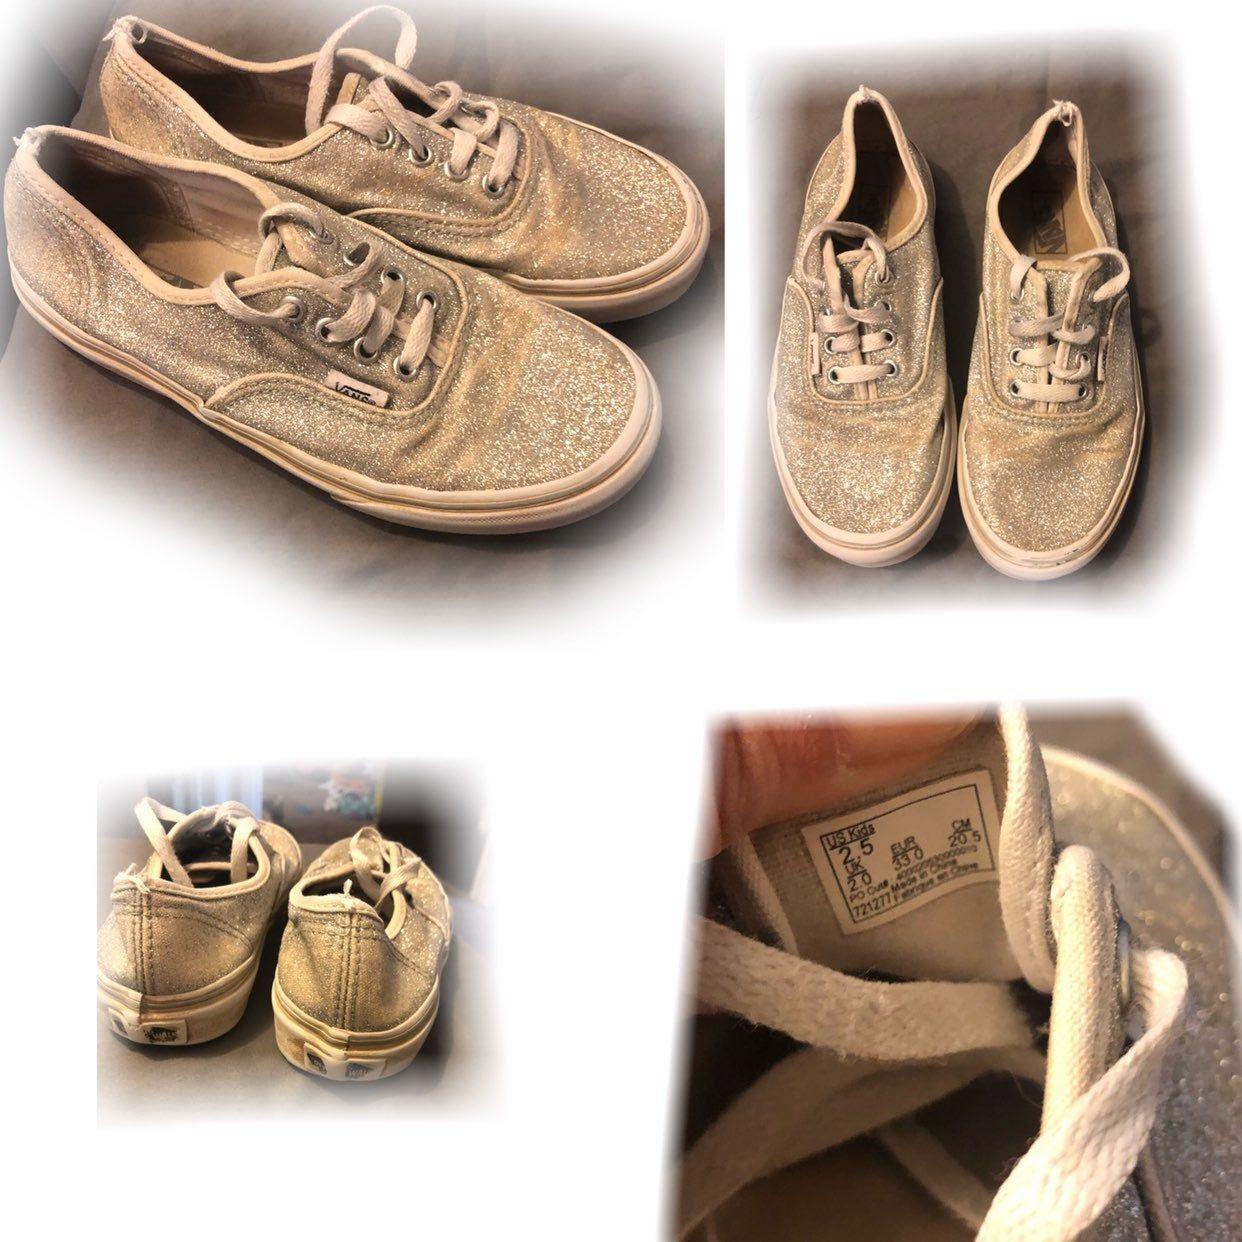 Size girls, Vans, Vans shoes